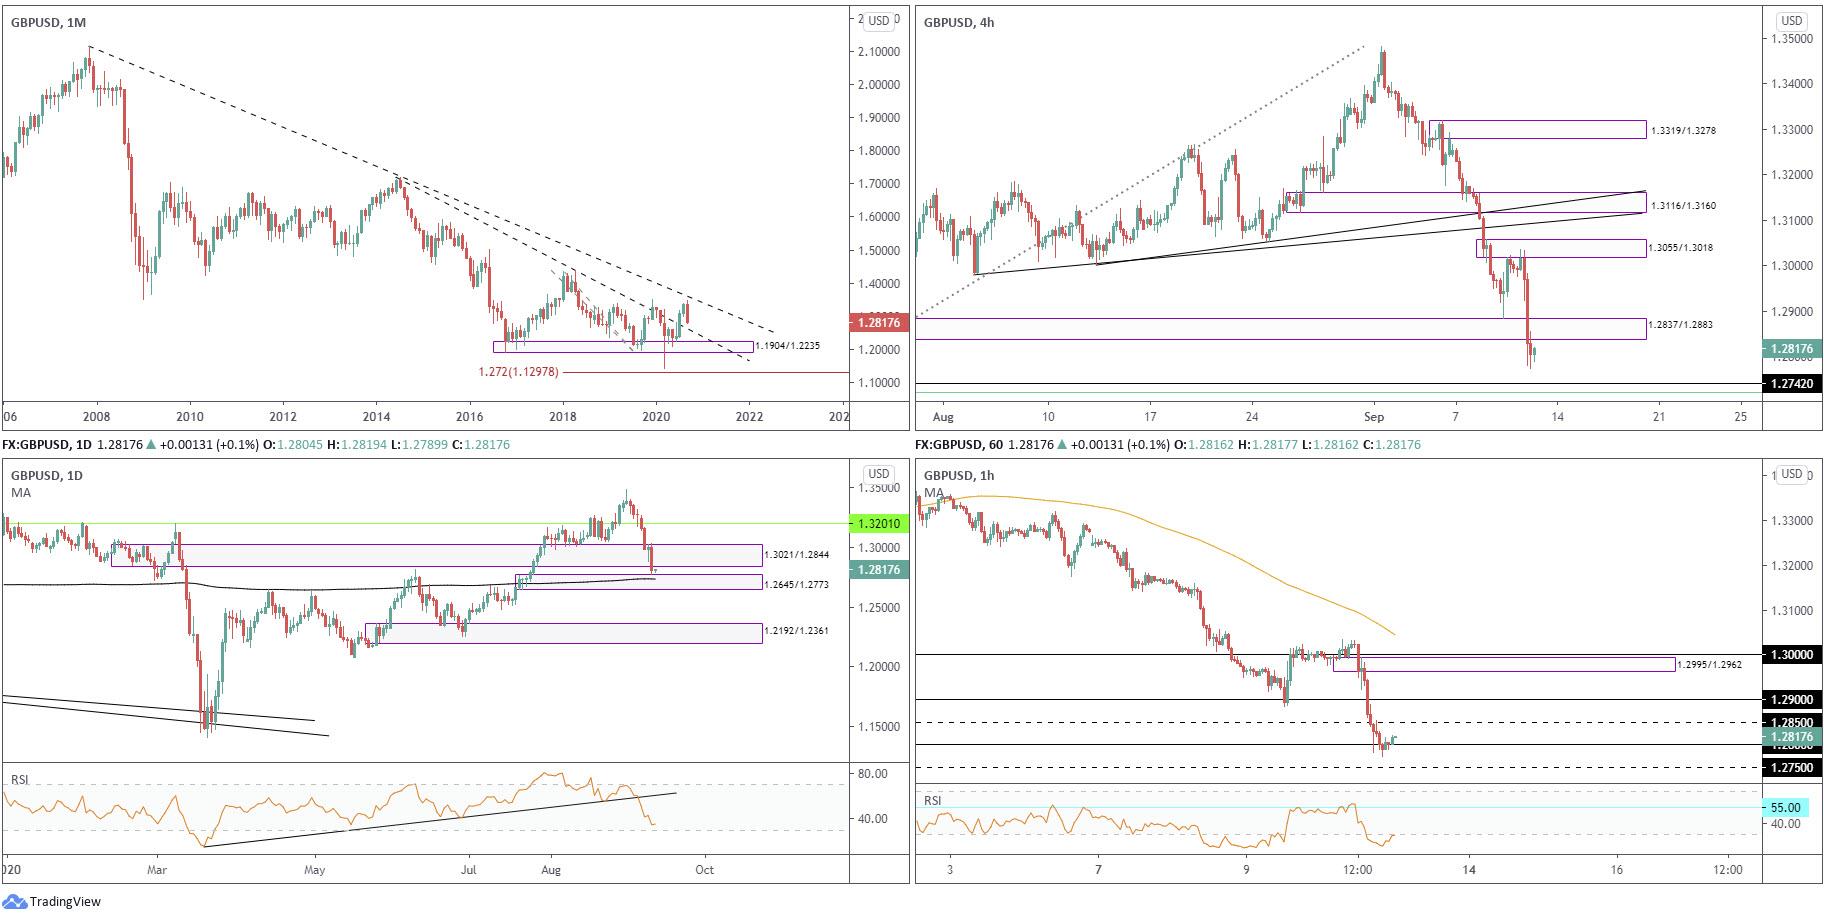 September 11th 2020: Downbeat Risk Sentiment Sees EURUSD Pare ECB-Driven Gains, FP Markets